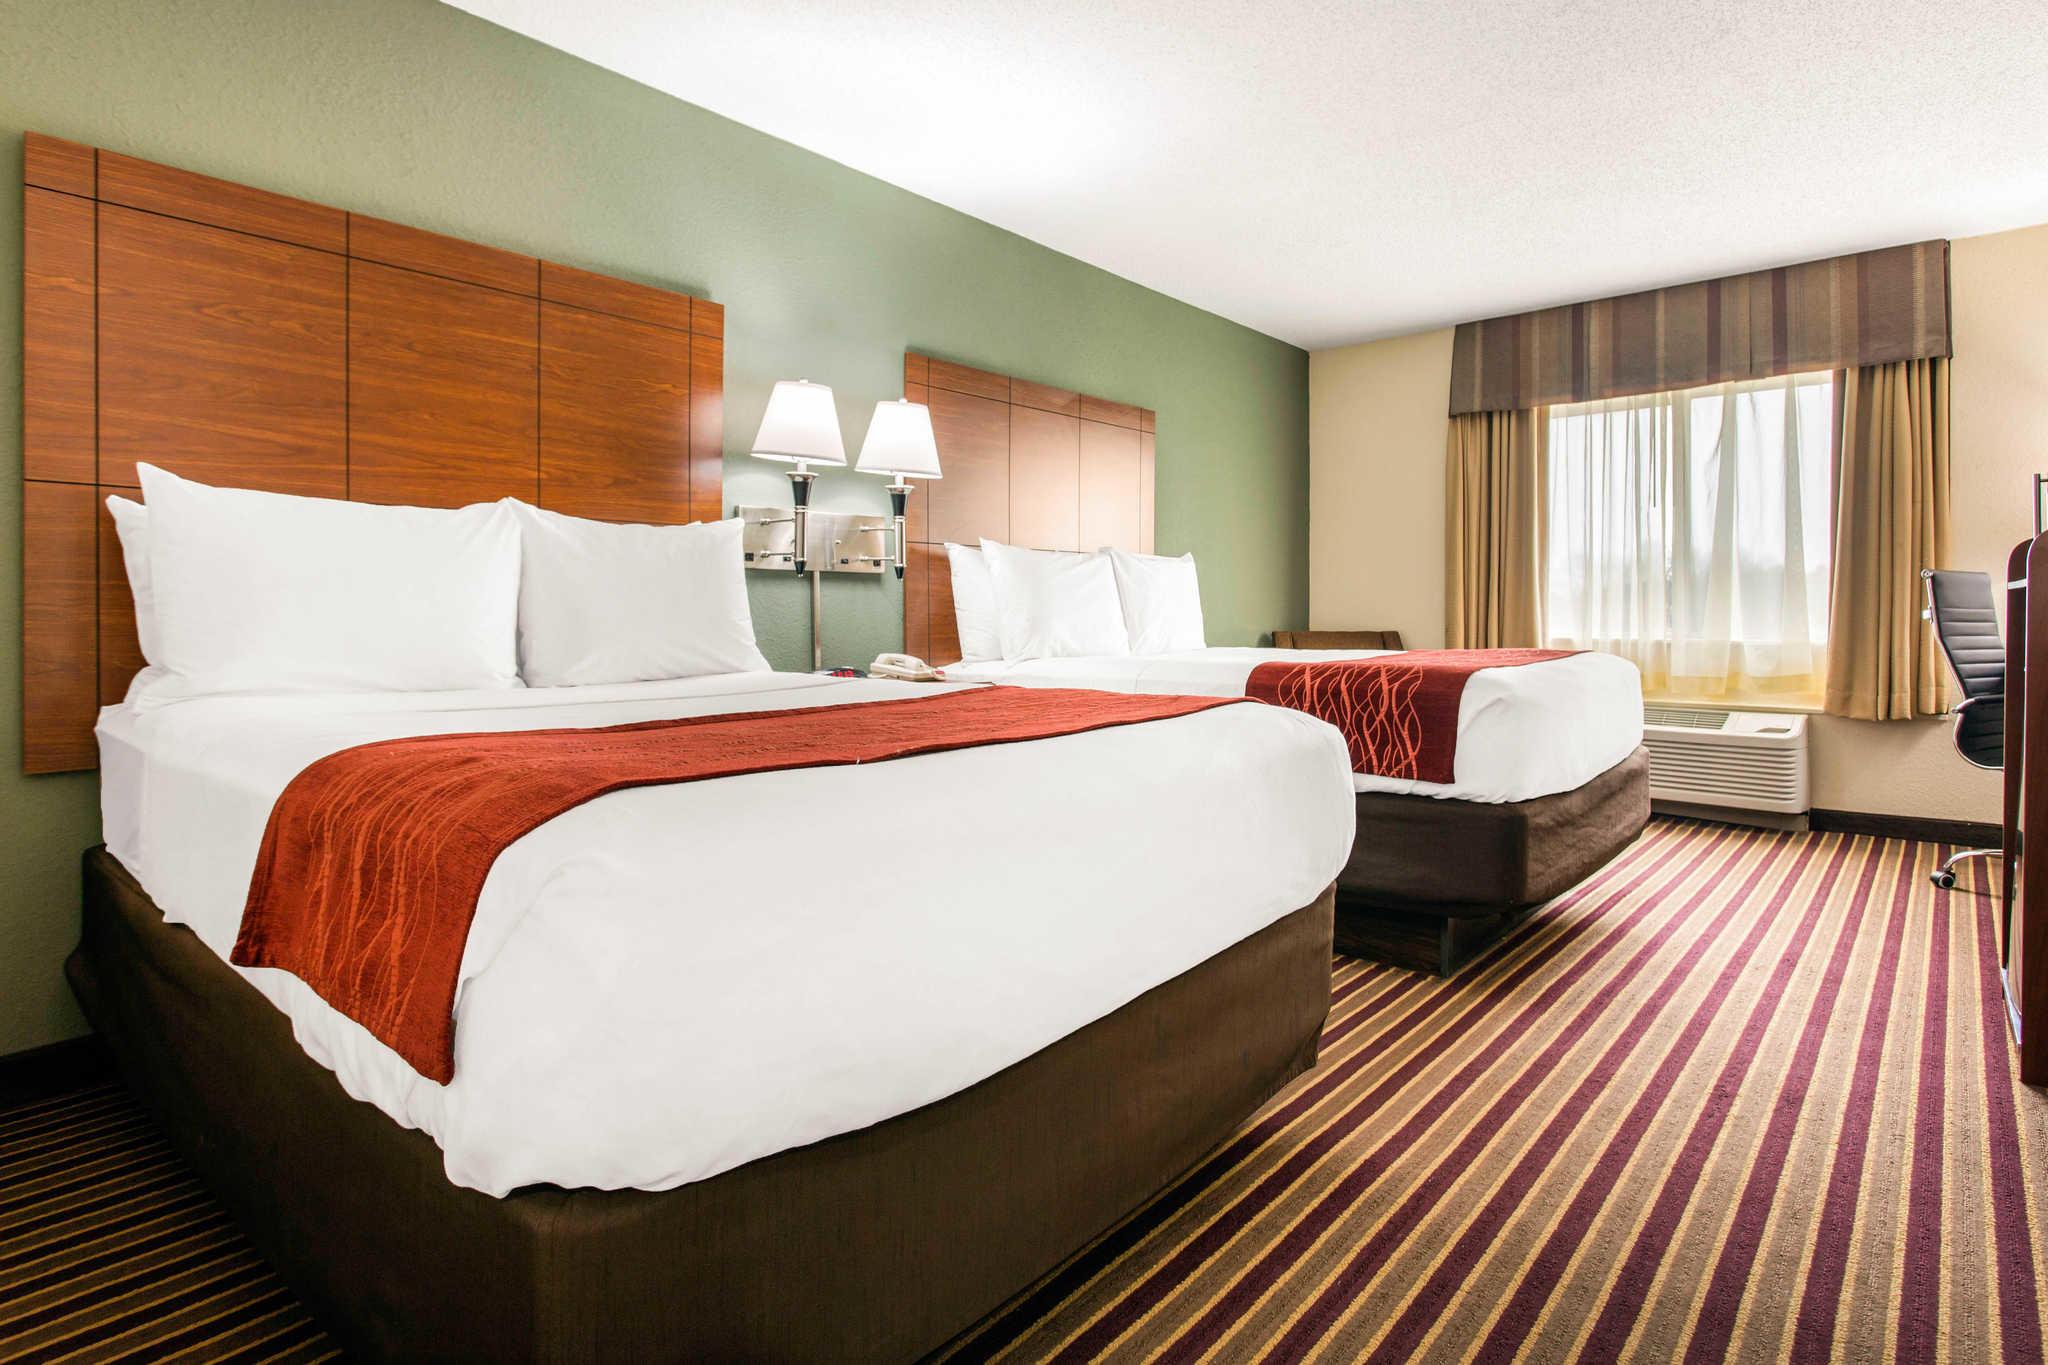 Comfort Inn & Suites Crabtree Valley image 23